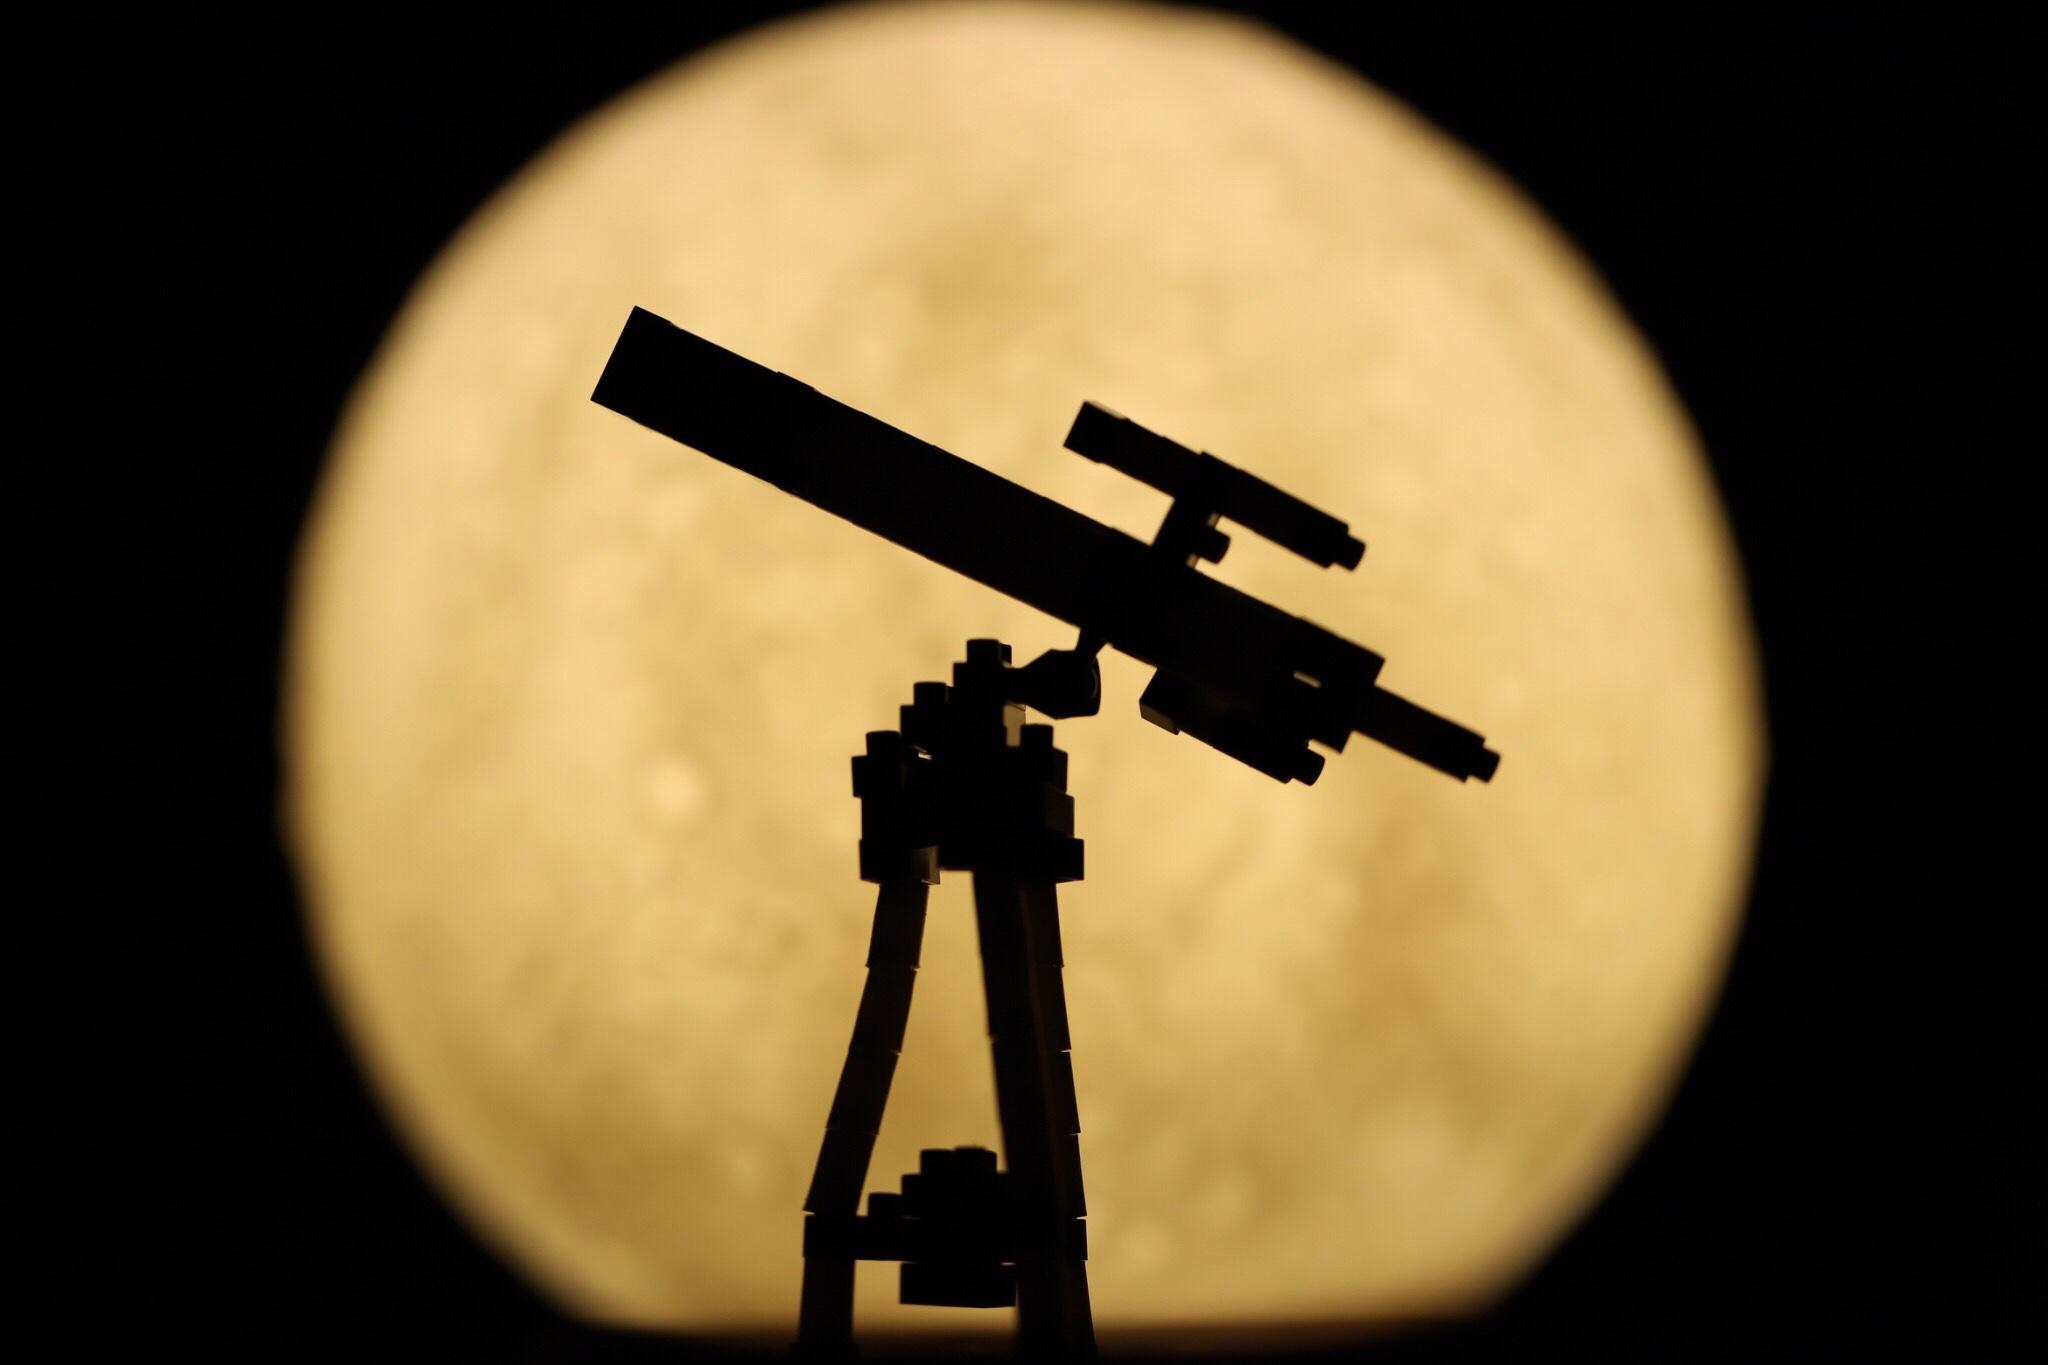 天体望遠鏡と月